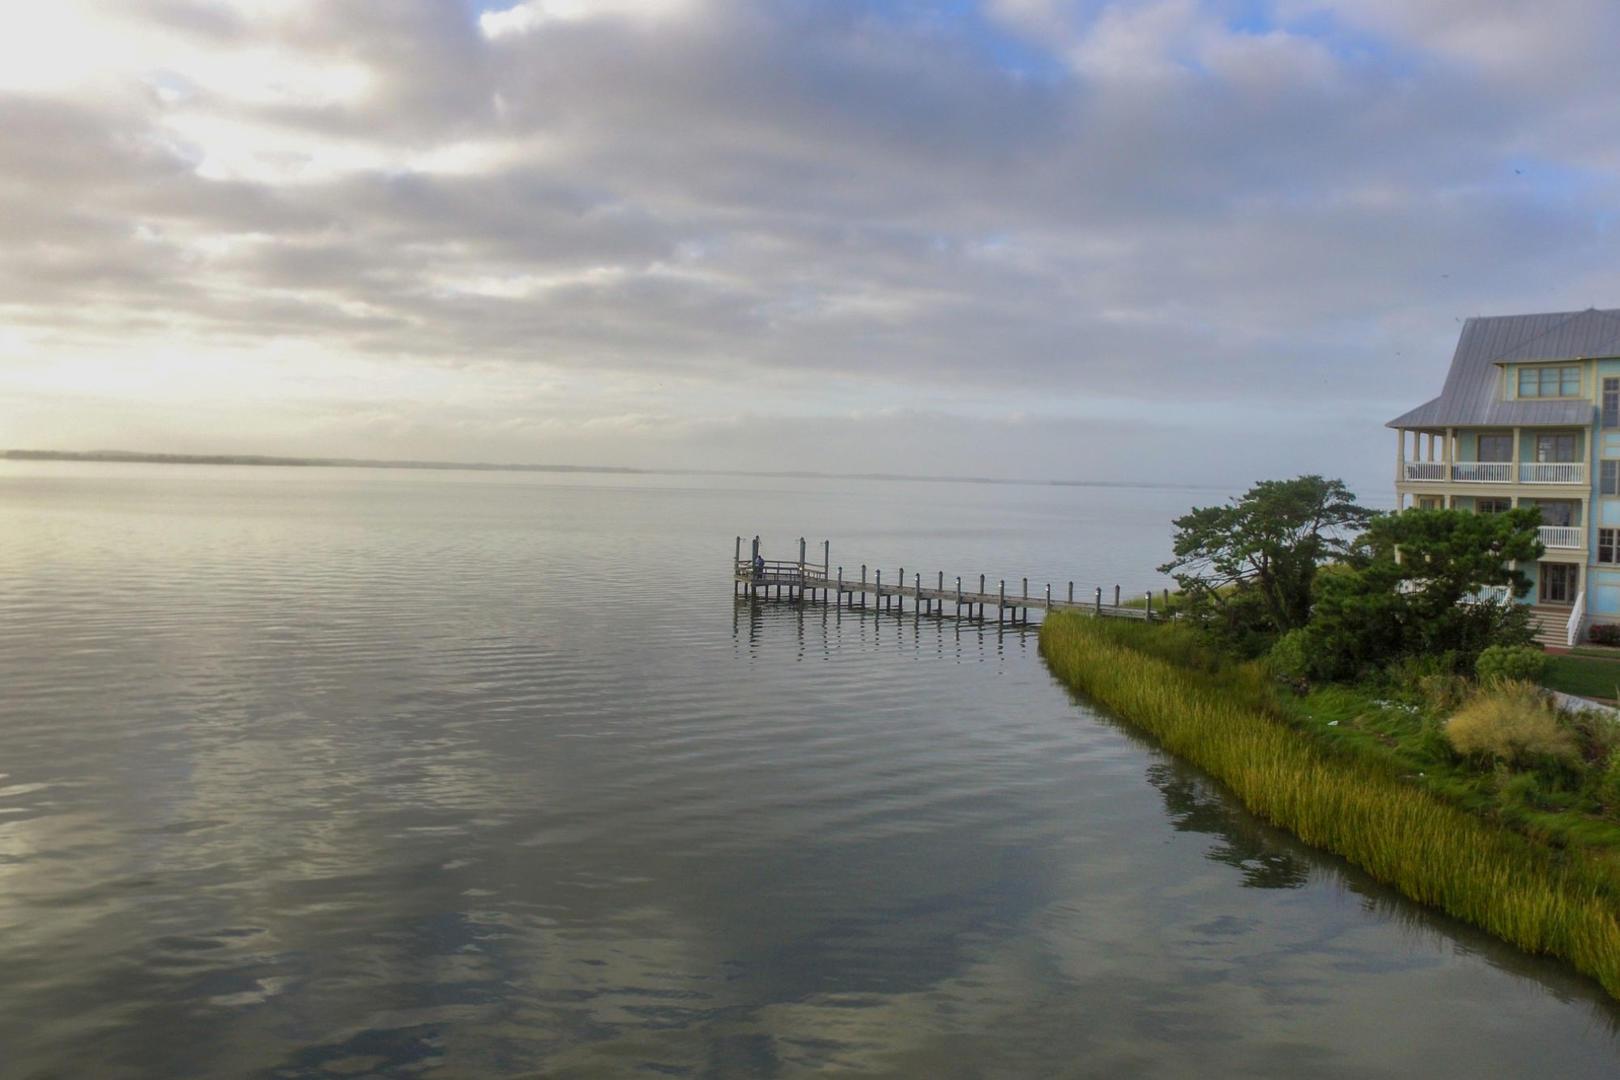 Sunset Island - Fishing and Crabbing Pier